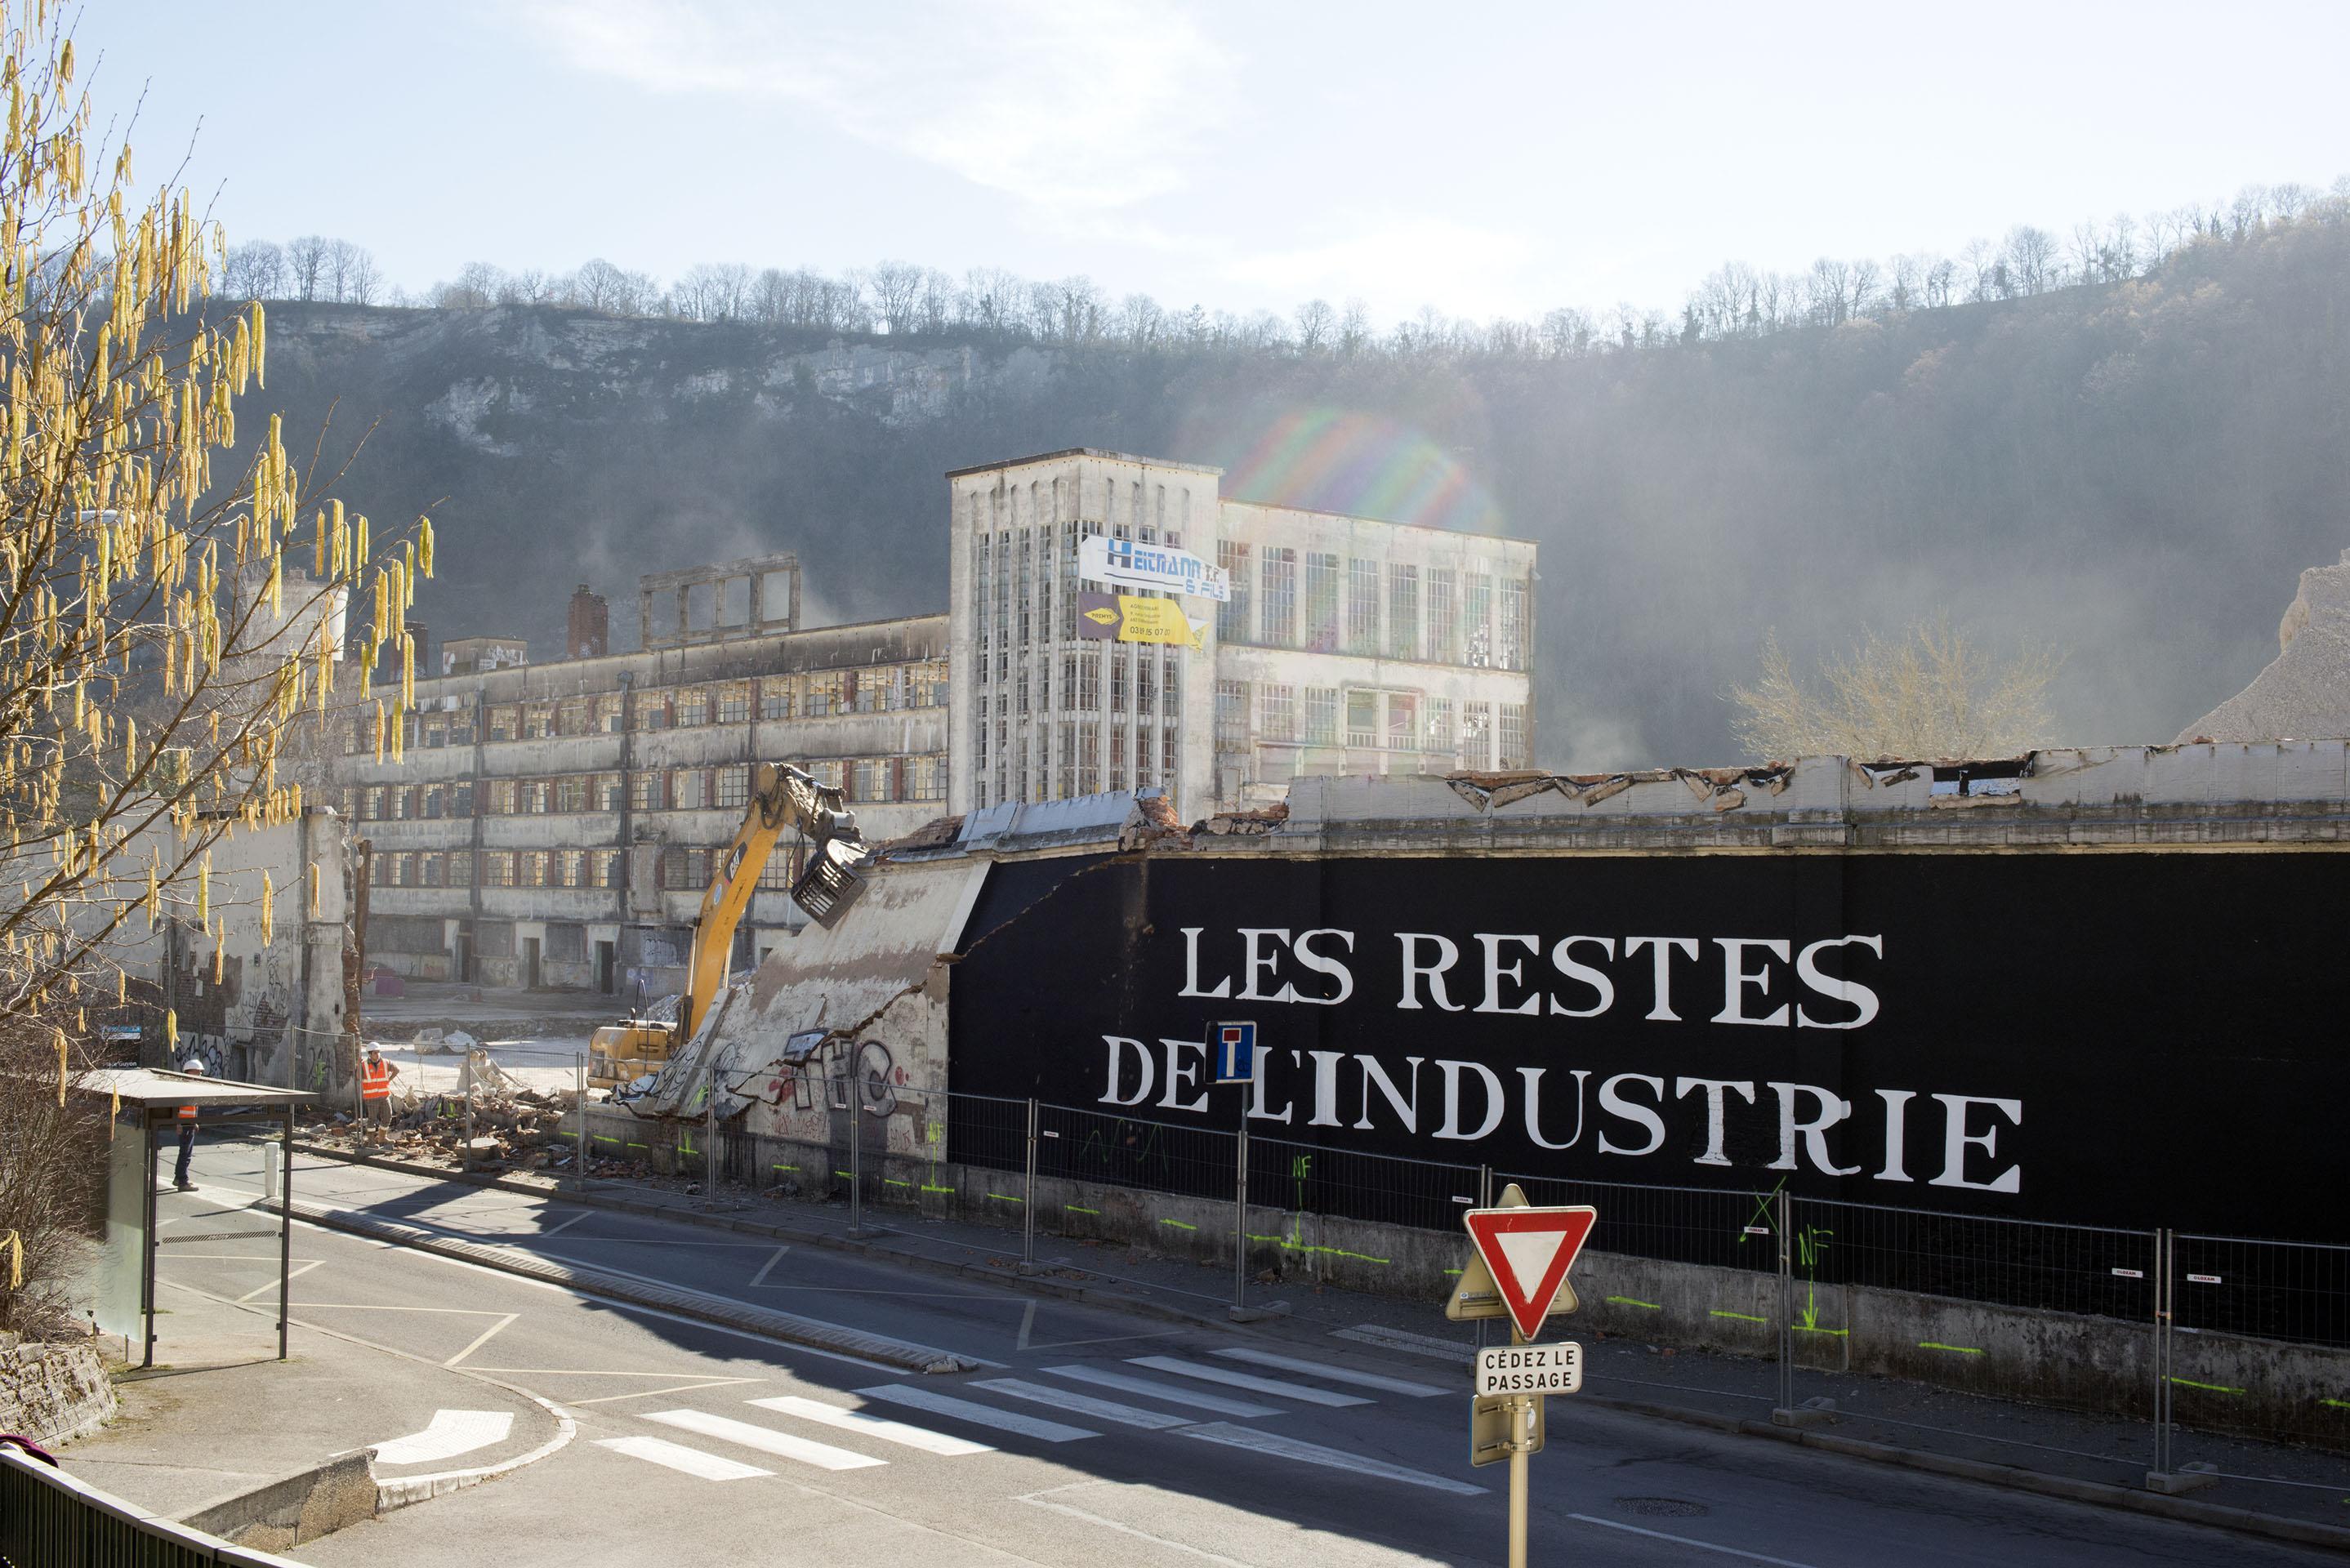 Chute mur John Fecker. Bien Urbain. Besancon. France 2019.